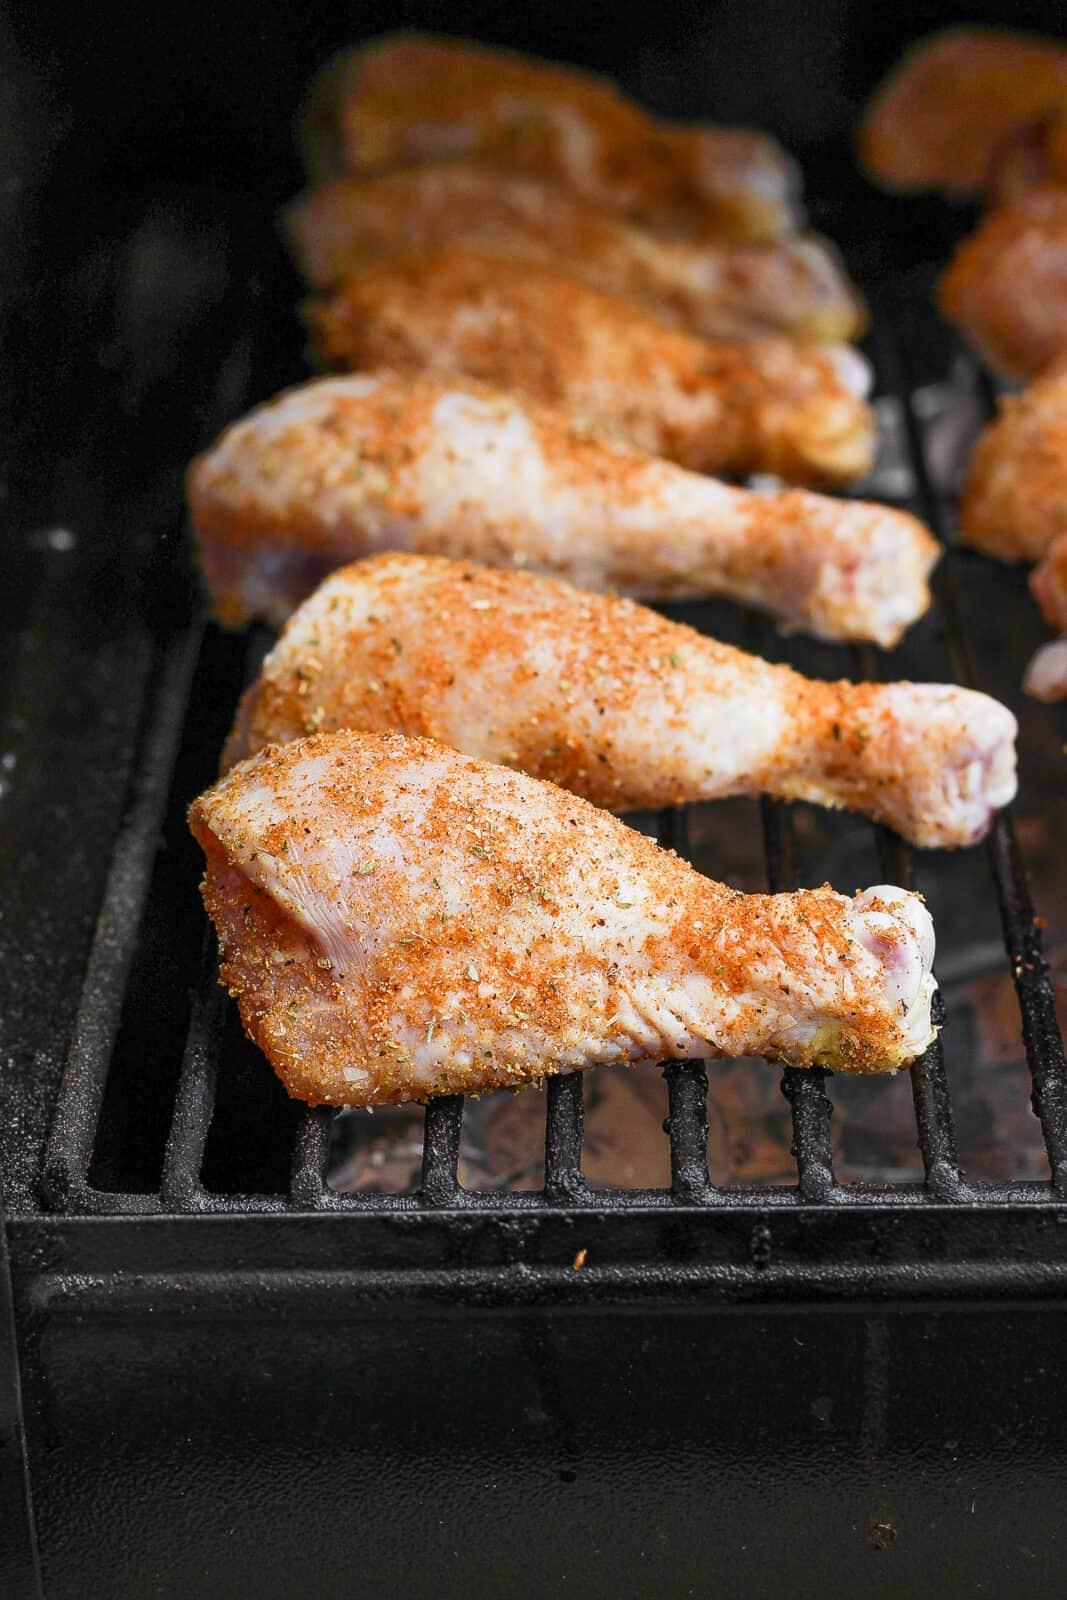 Chicken legs on a smoker.